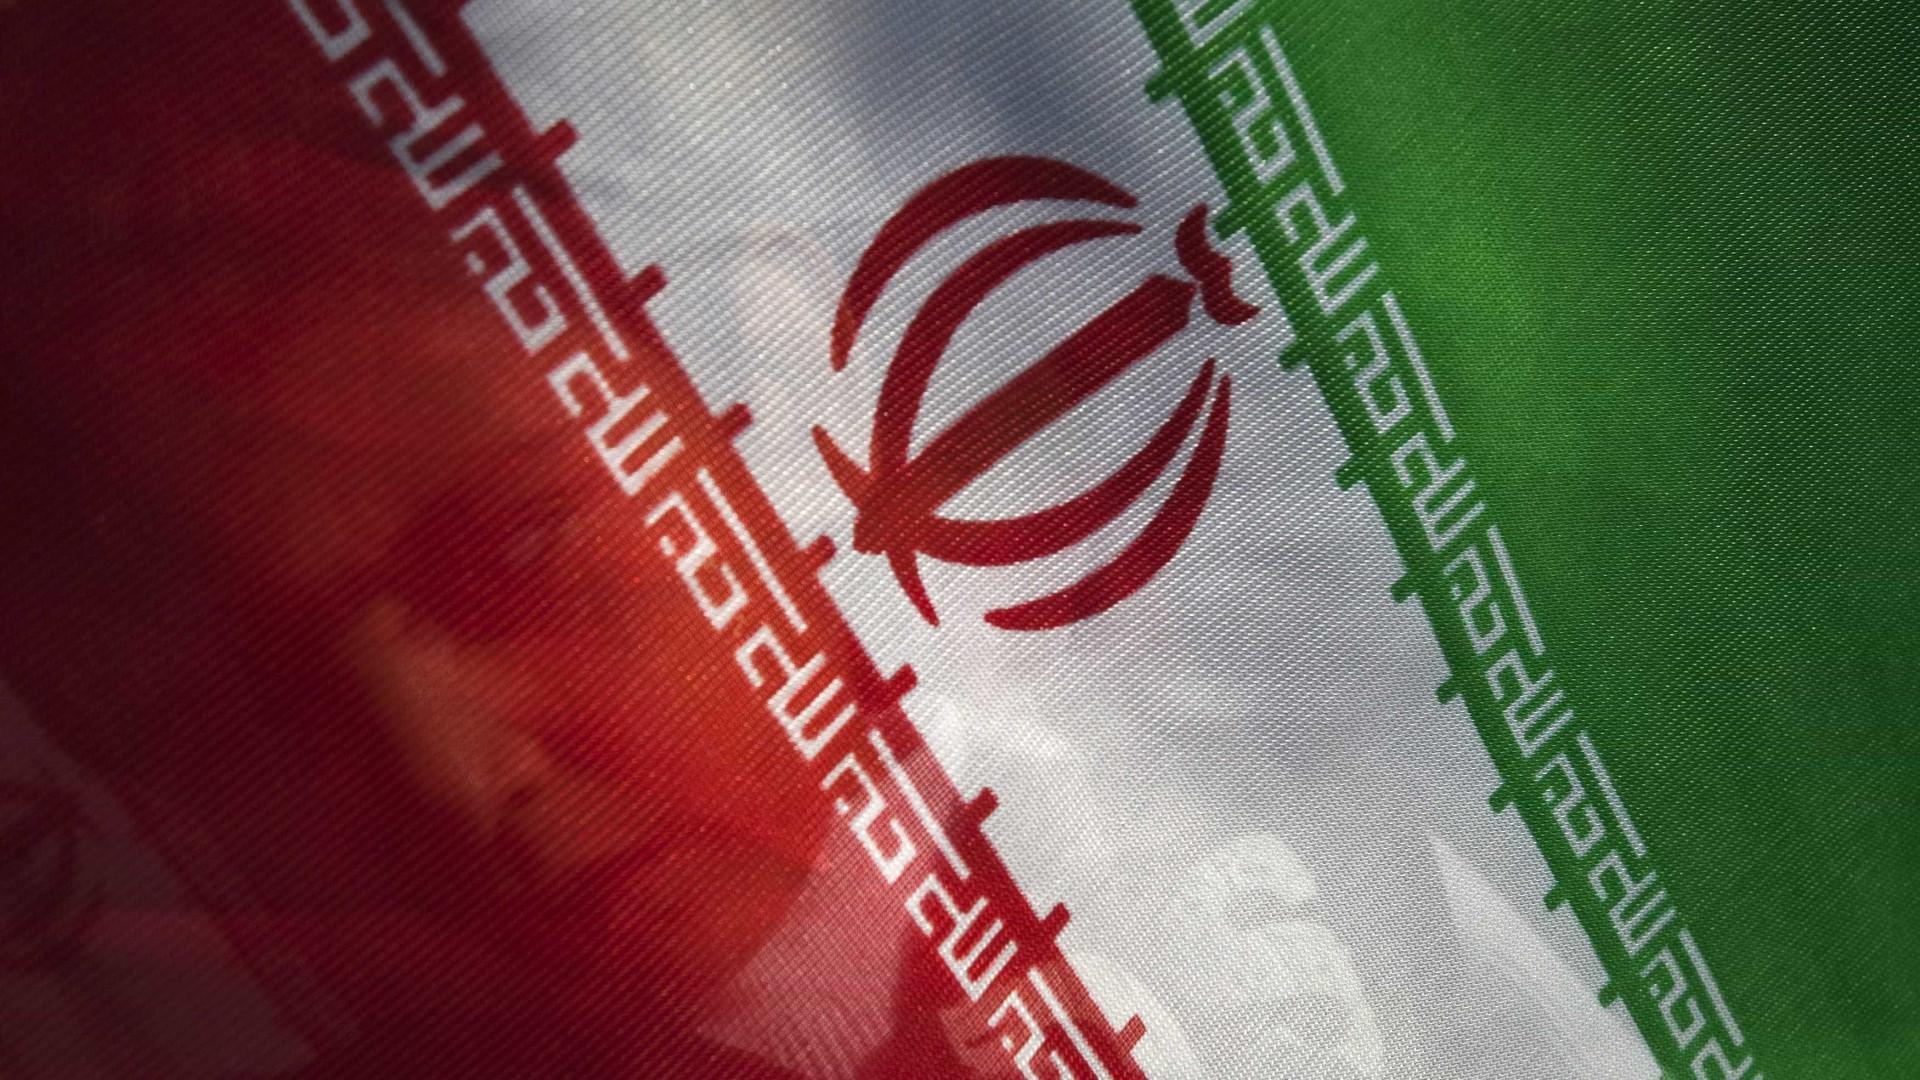 Diplomacia iraniana acusa Trump de procurar sabotar acordo nuclear